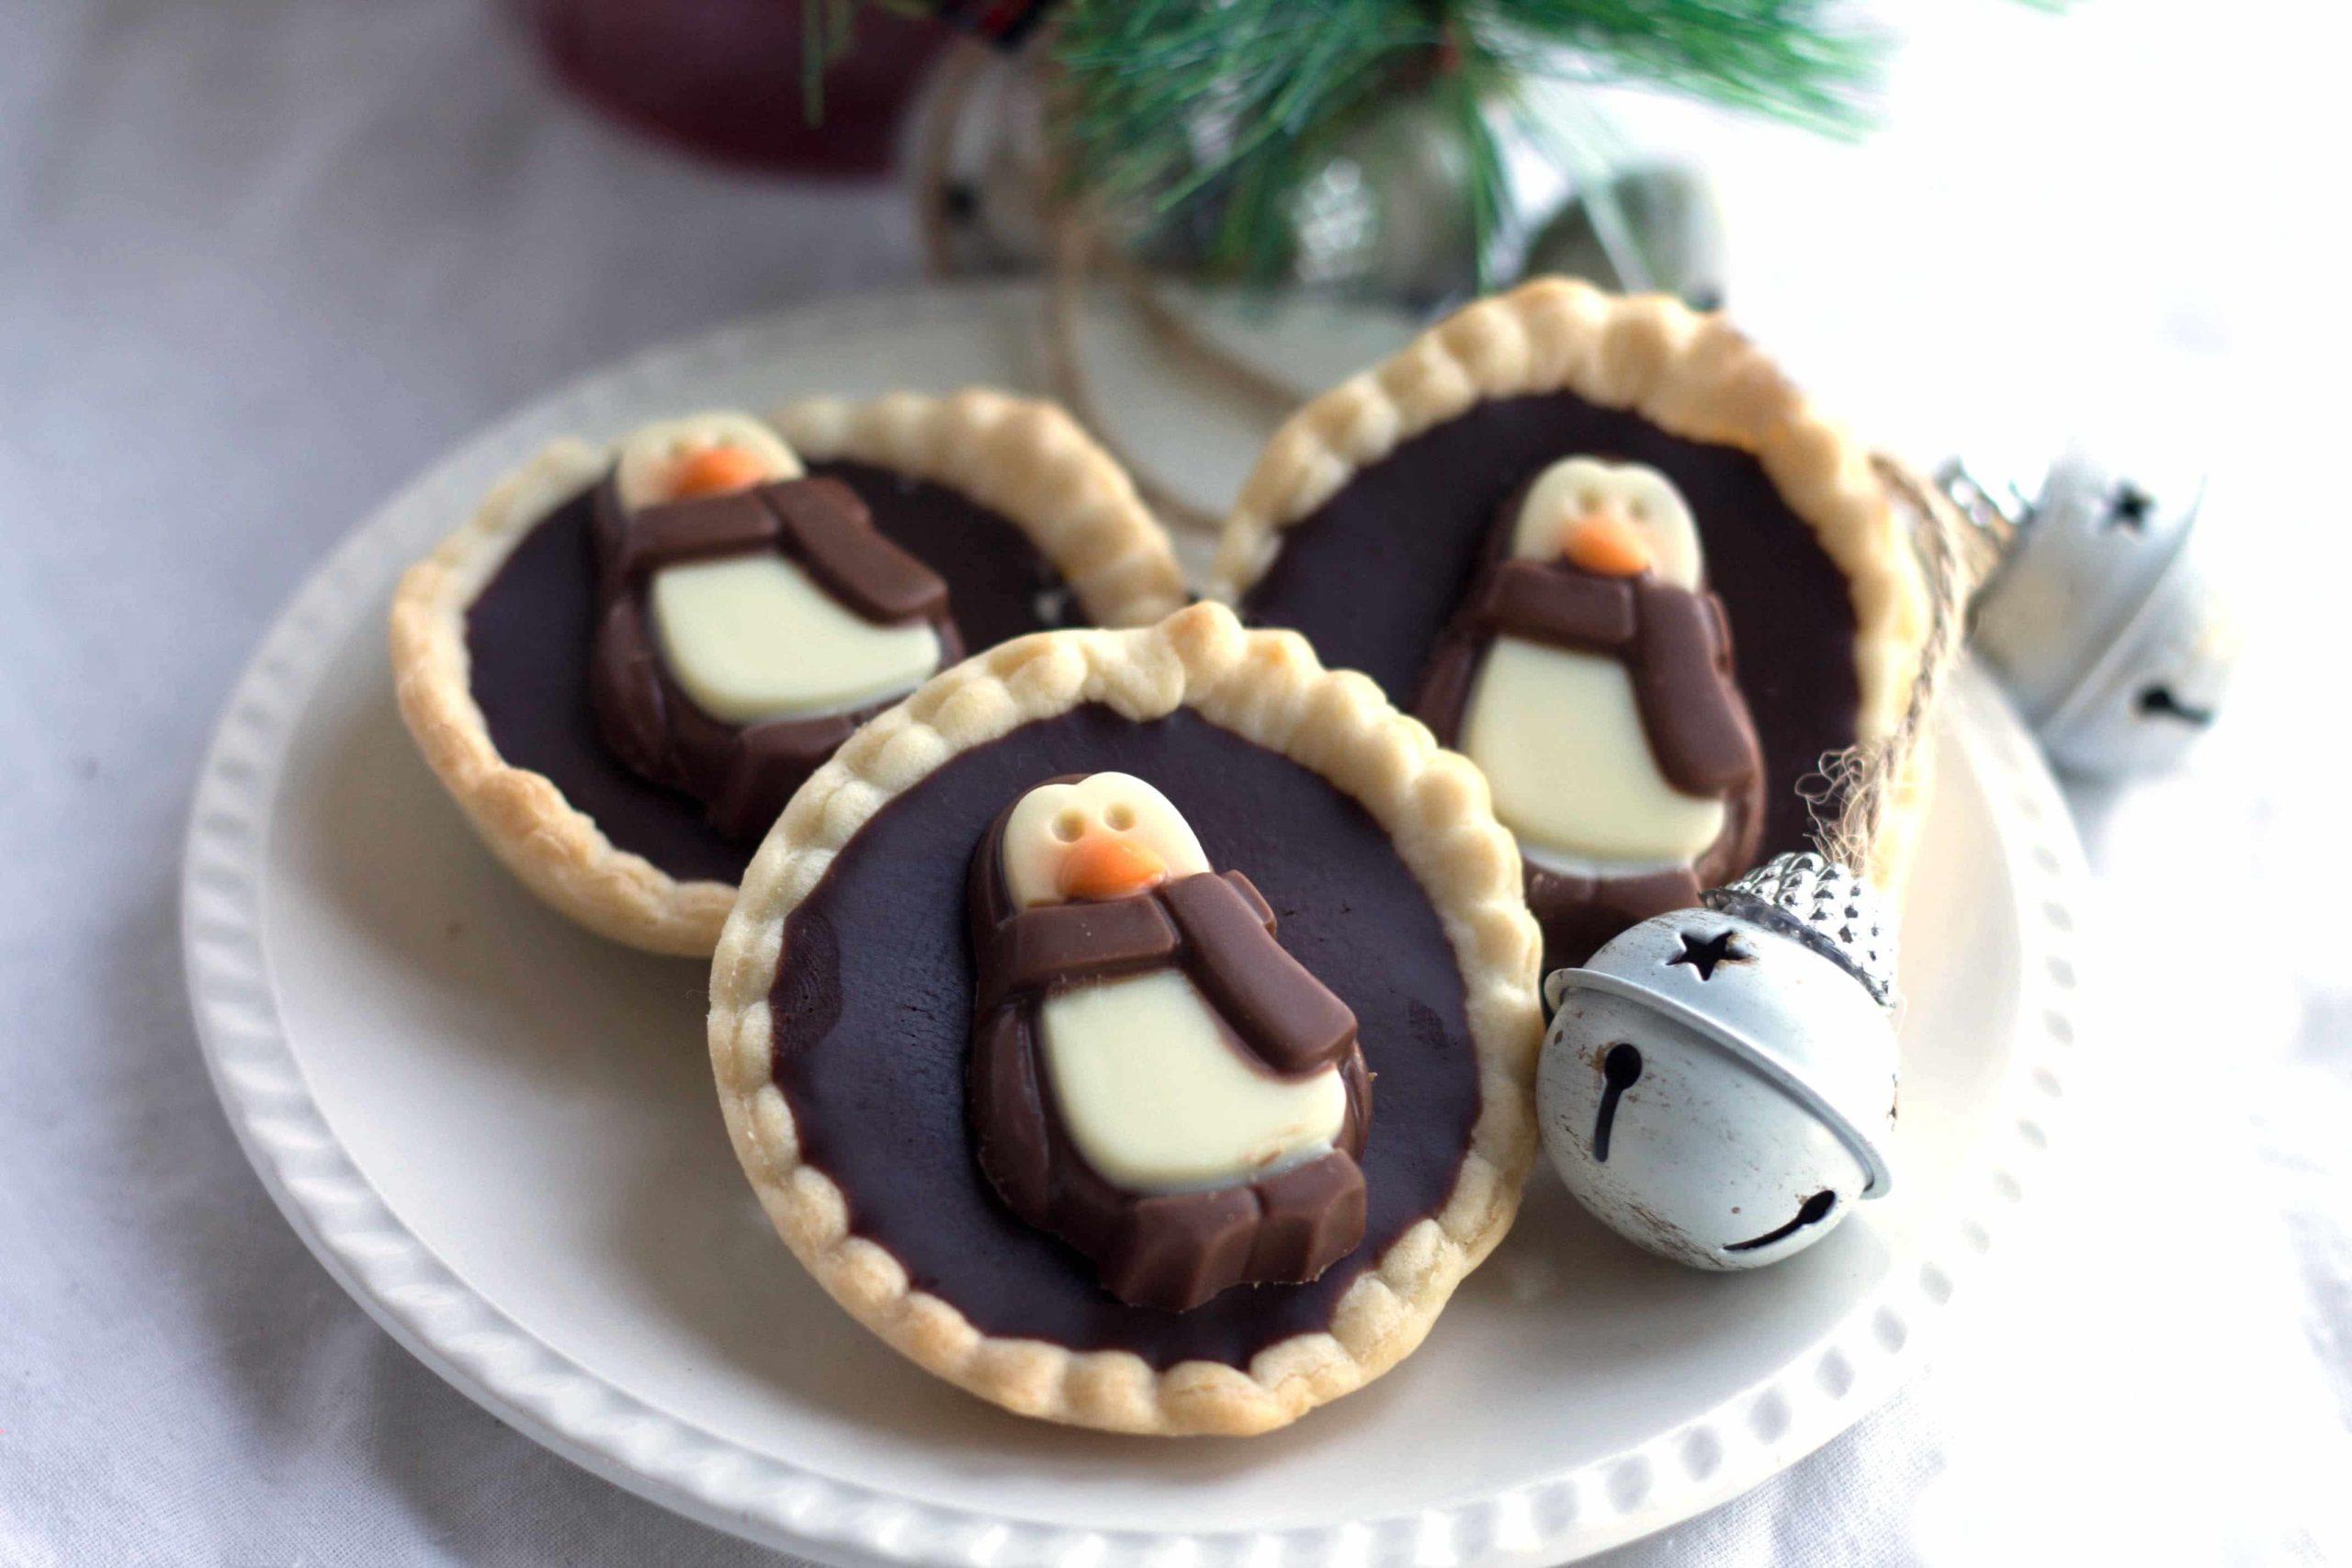 dark chocolate ganache tarts decorated with chocolate penguins